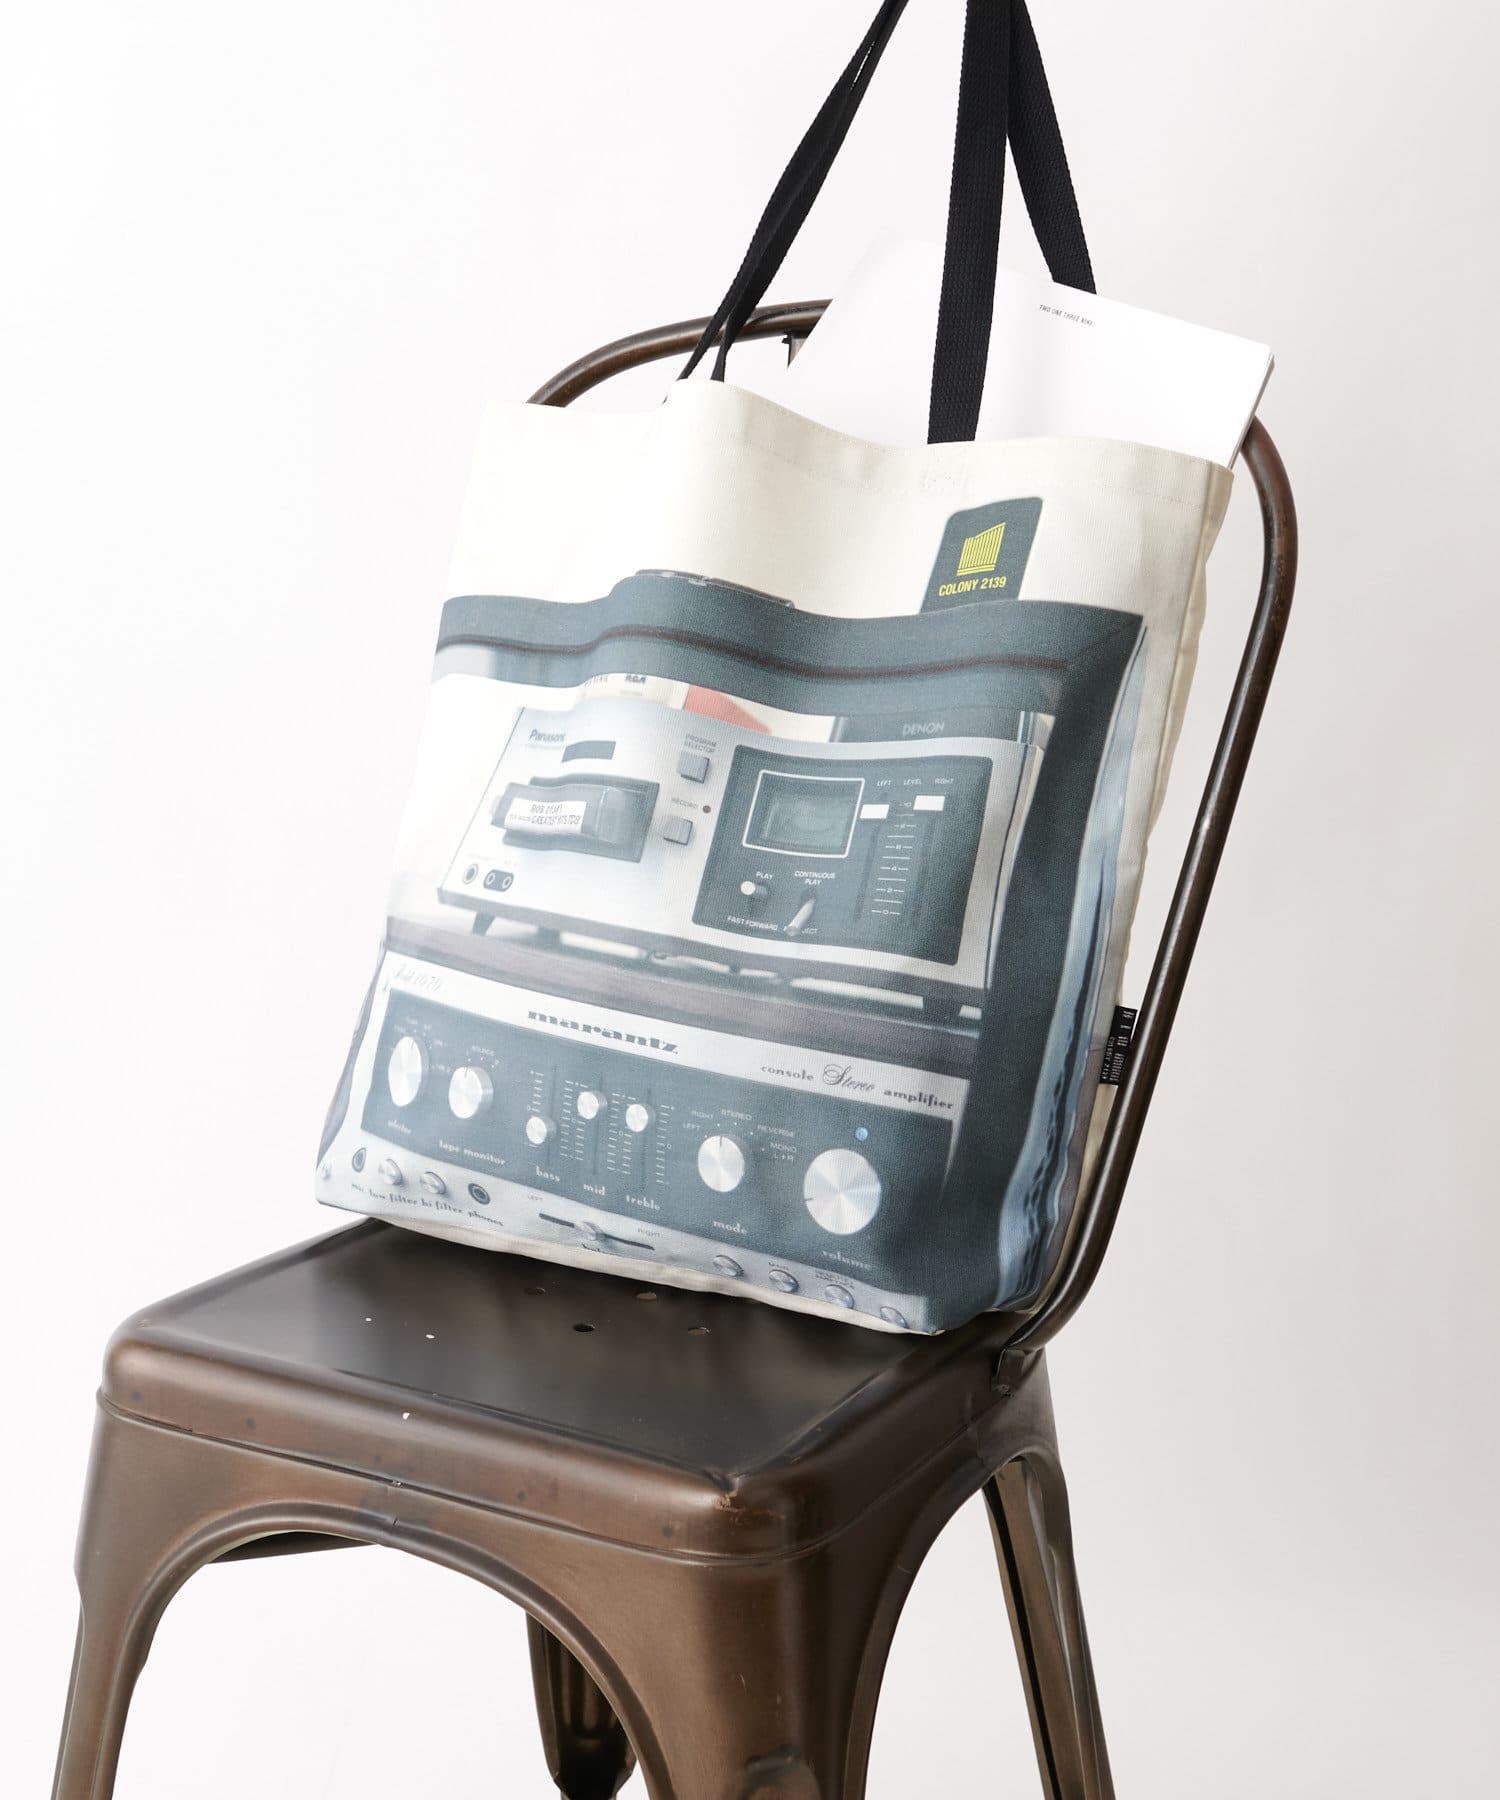 COLONY 2139(コロニー トゥーワンスリーナイン) メッセージトートバッグ/マチ付きA4収納可能トート